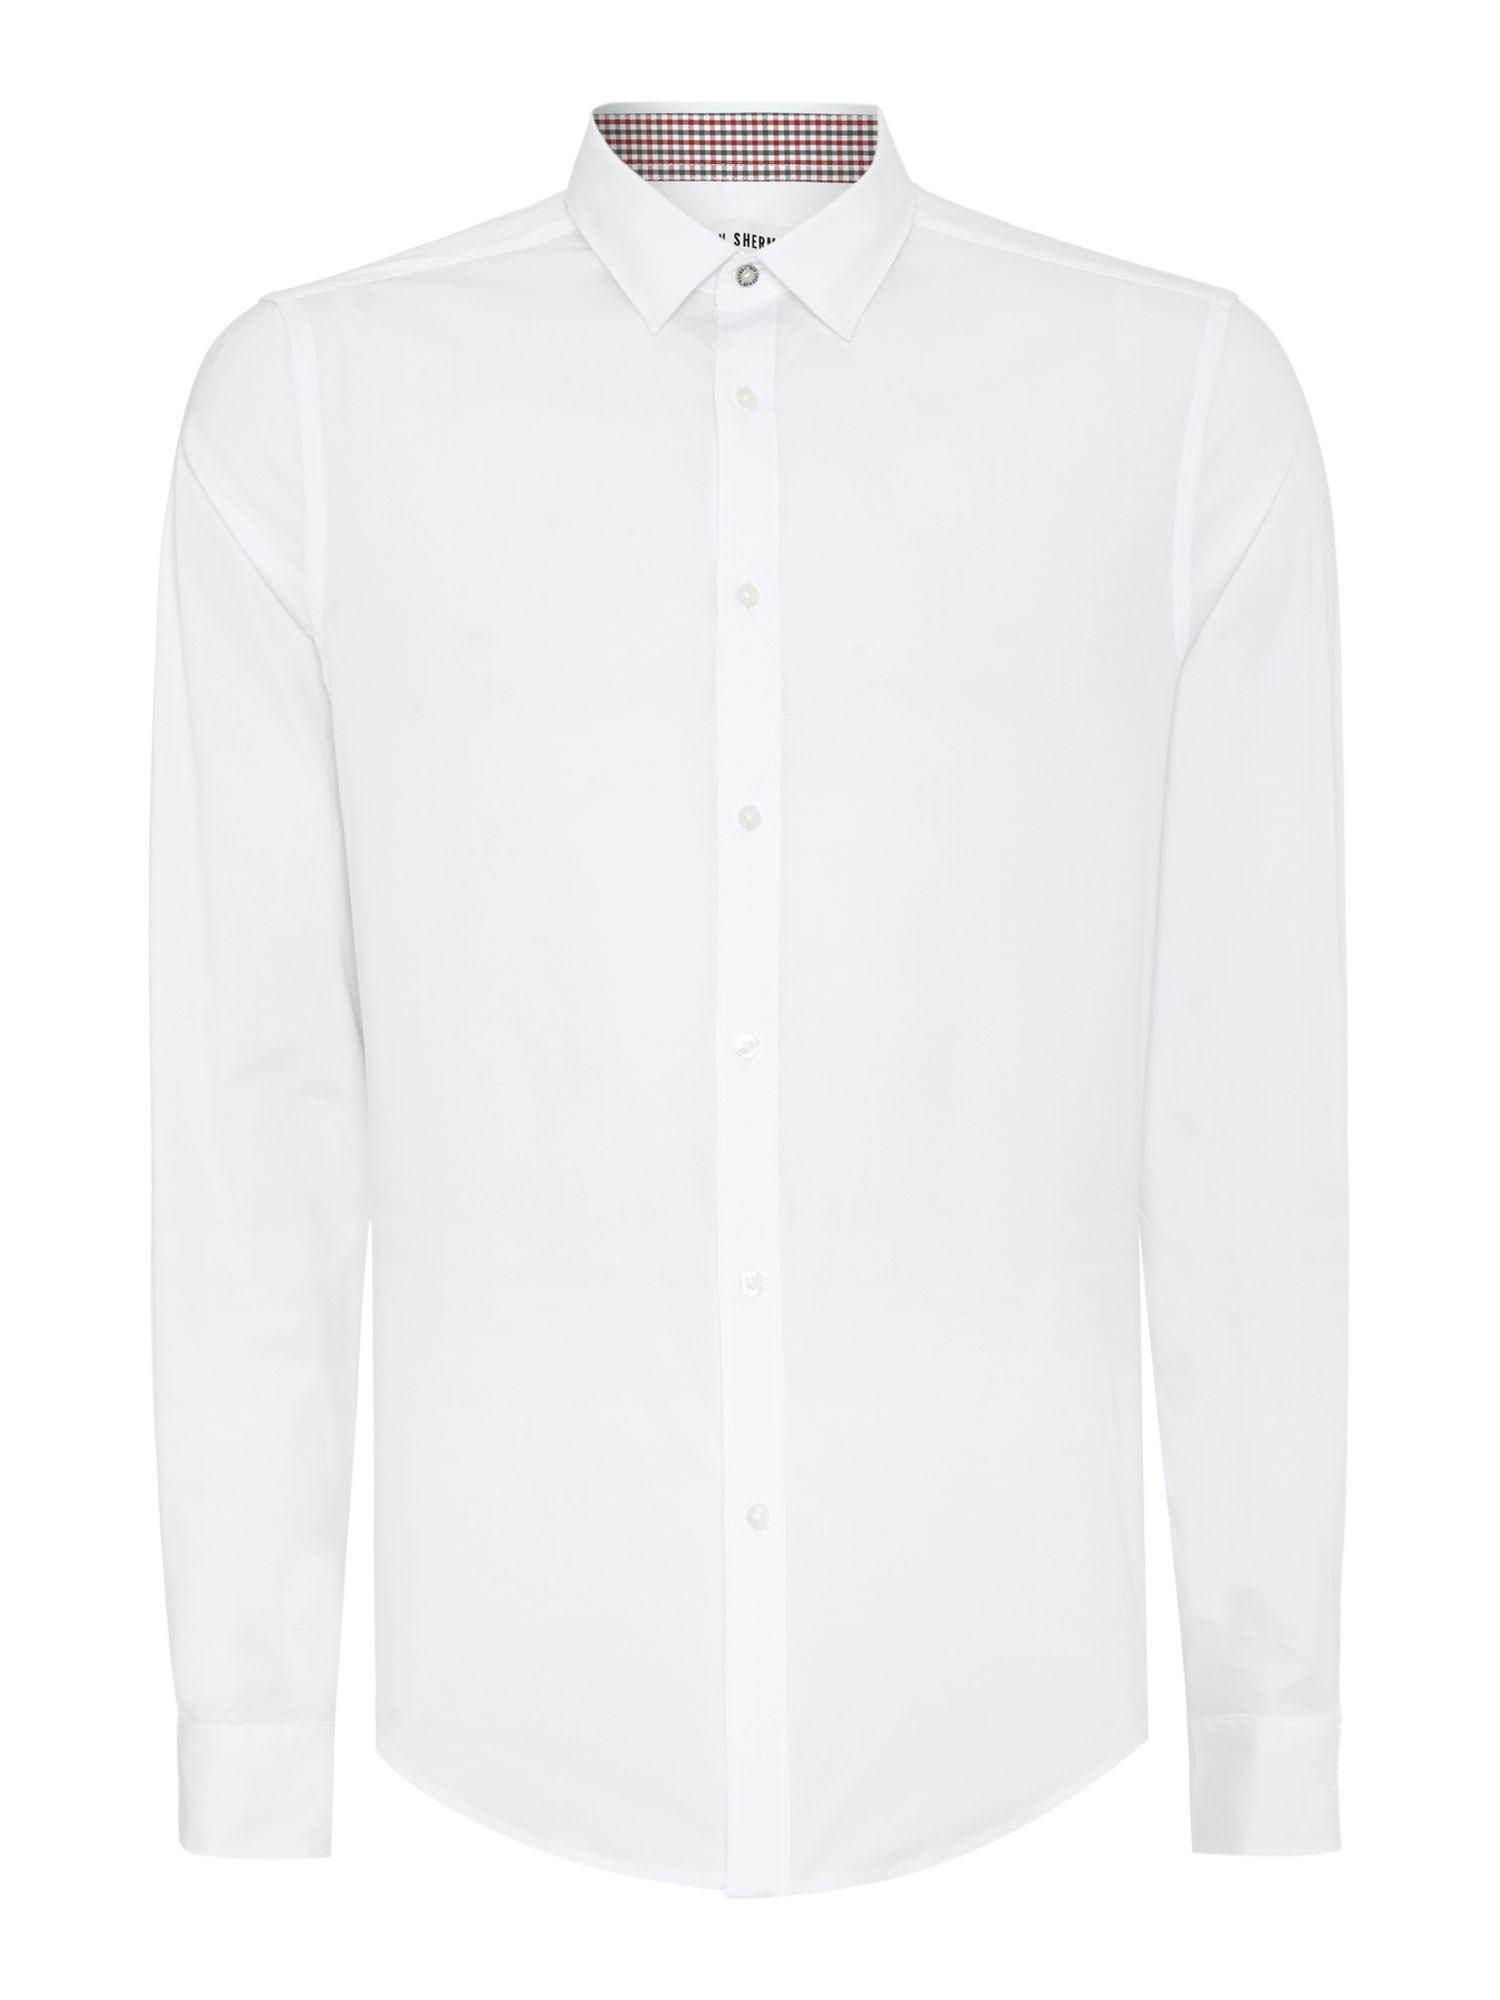 Ben sherman stretch poplin long sleeve shirt in white for for Long sleeve poplin shirt